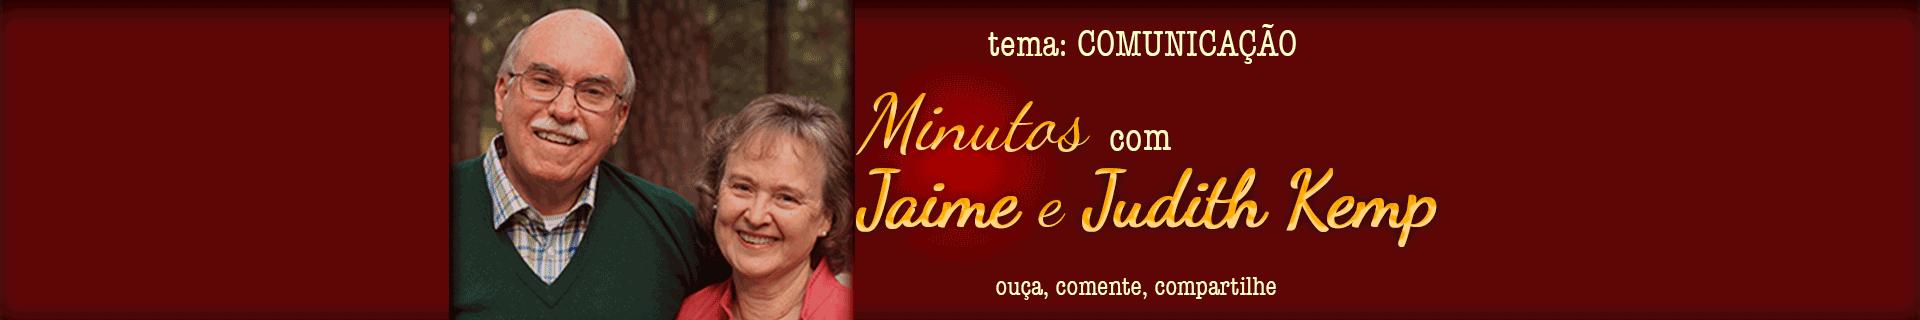 SITE-MeditacoesComunicacao